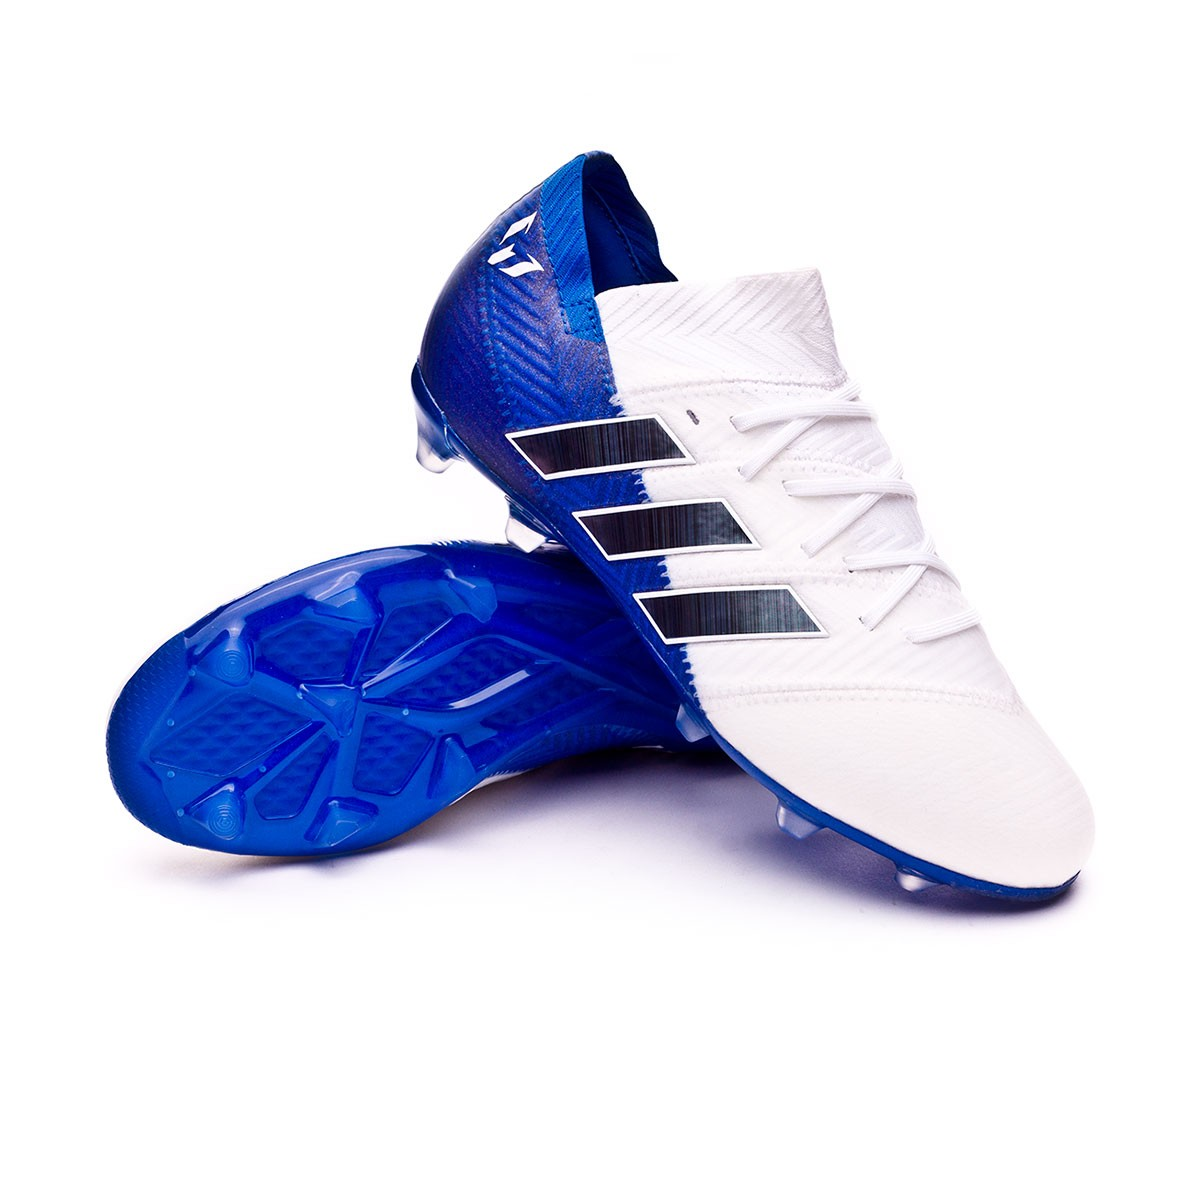 057ae5133 Football Boots adidas Kids Nemeziz Messi 18.1 FG White-Core black-Football  blue - Football store Fútbol Emotion